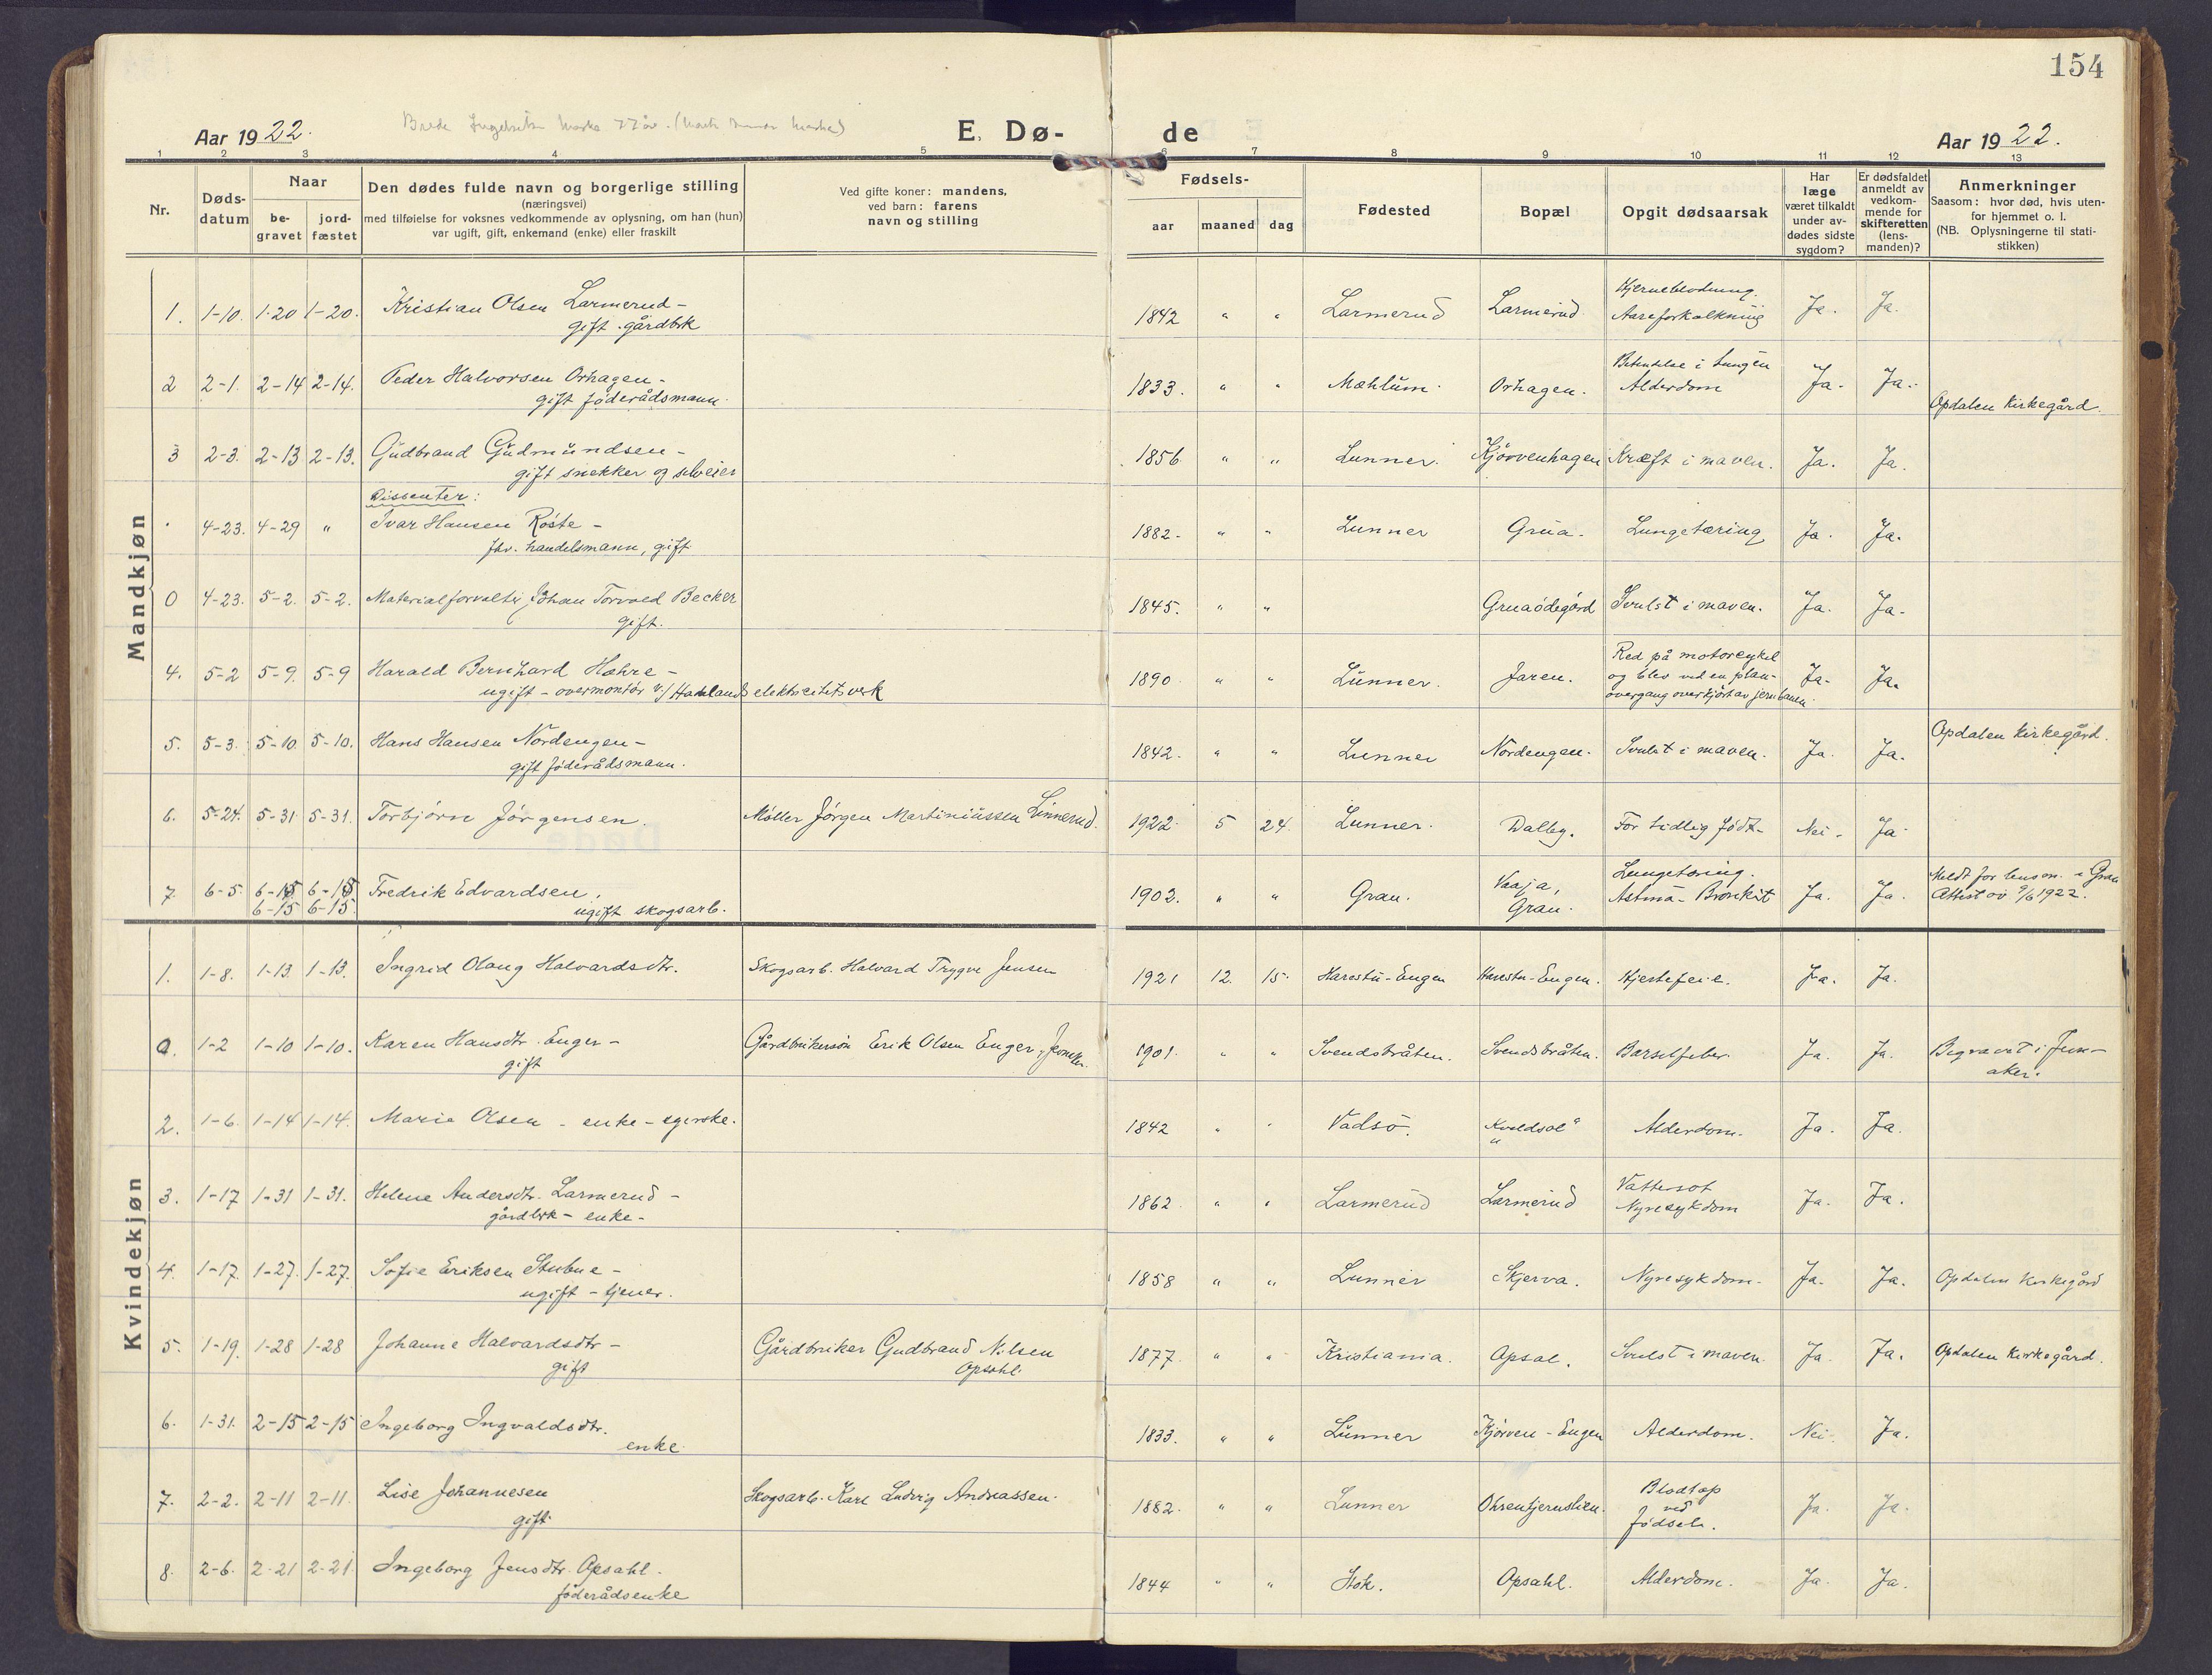 SAH, Lunner prestekontor, H/Ha/Haa/L0002: Ministerialbok nr. 2, 1922-1931, s. 154